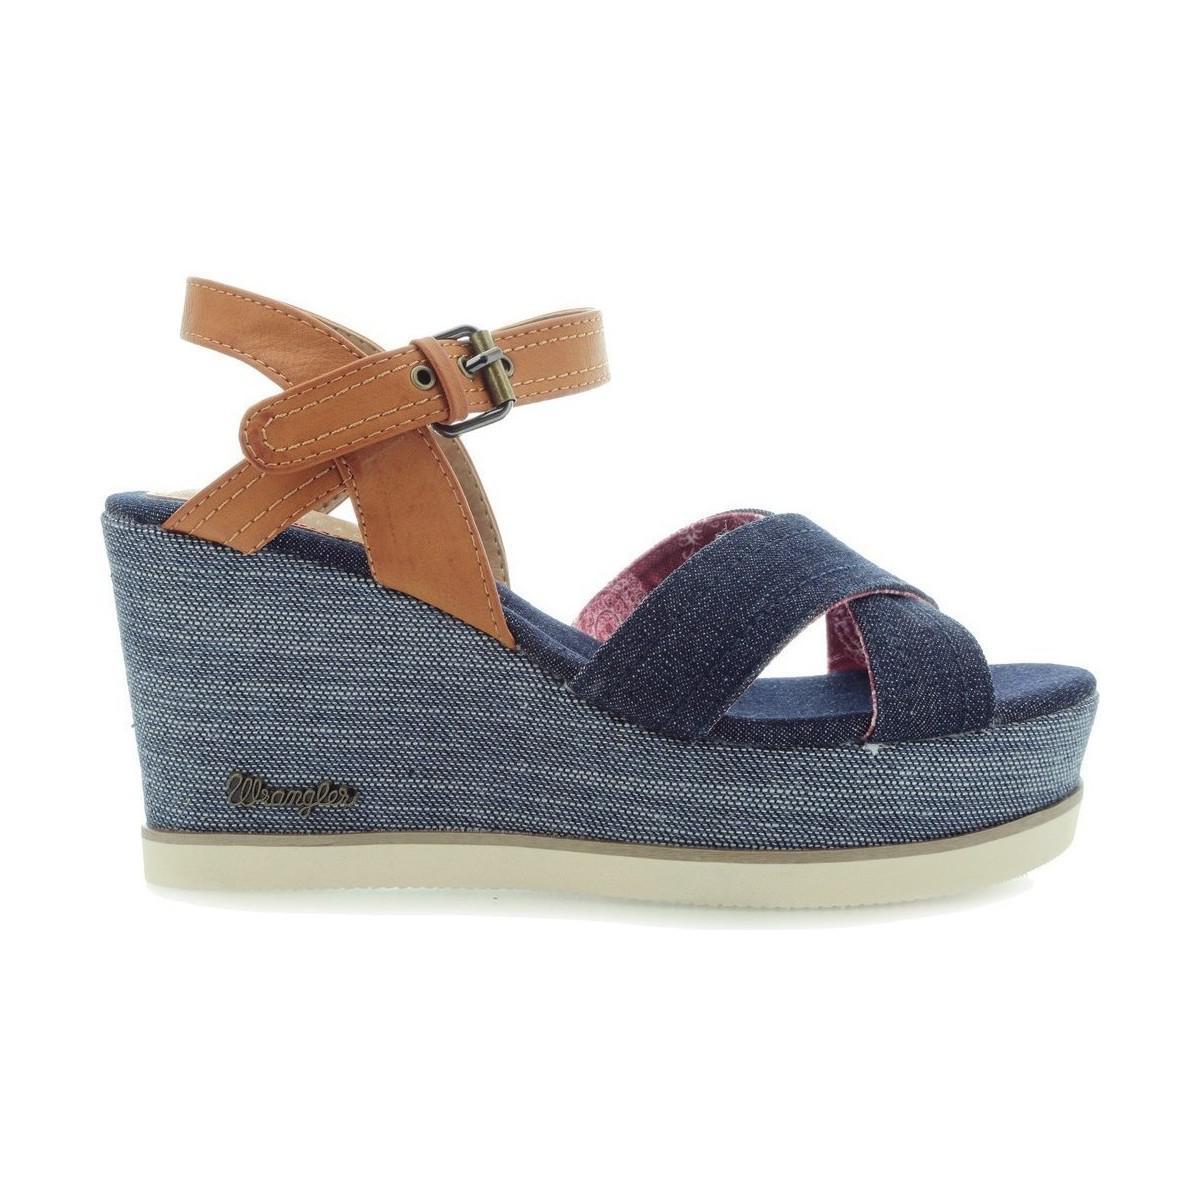 400b656925c0 wrangler-multicolour-Jeena-Indigo-Cross-Wl171680-Womens-Sandals-In-Multicolour.jpeg